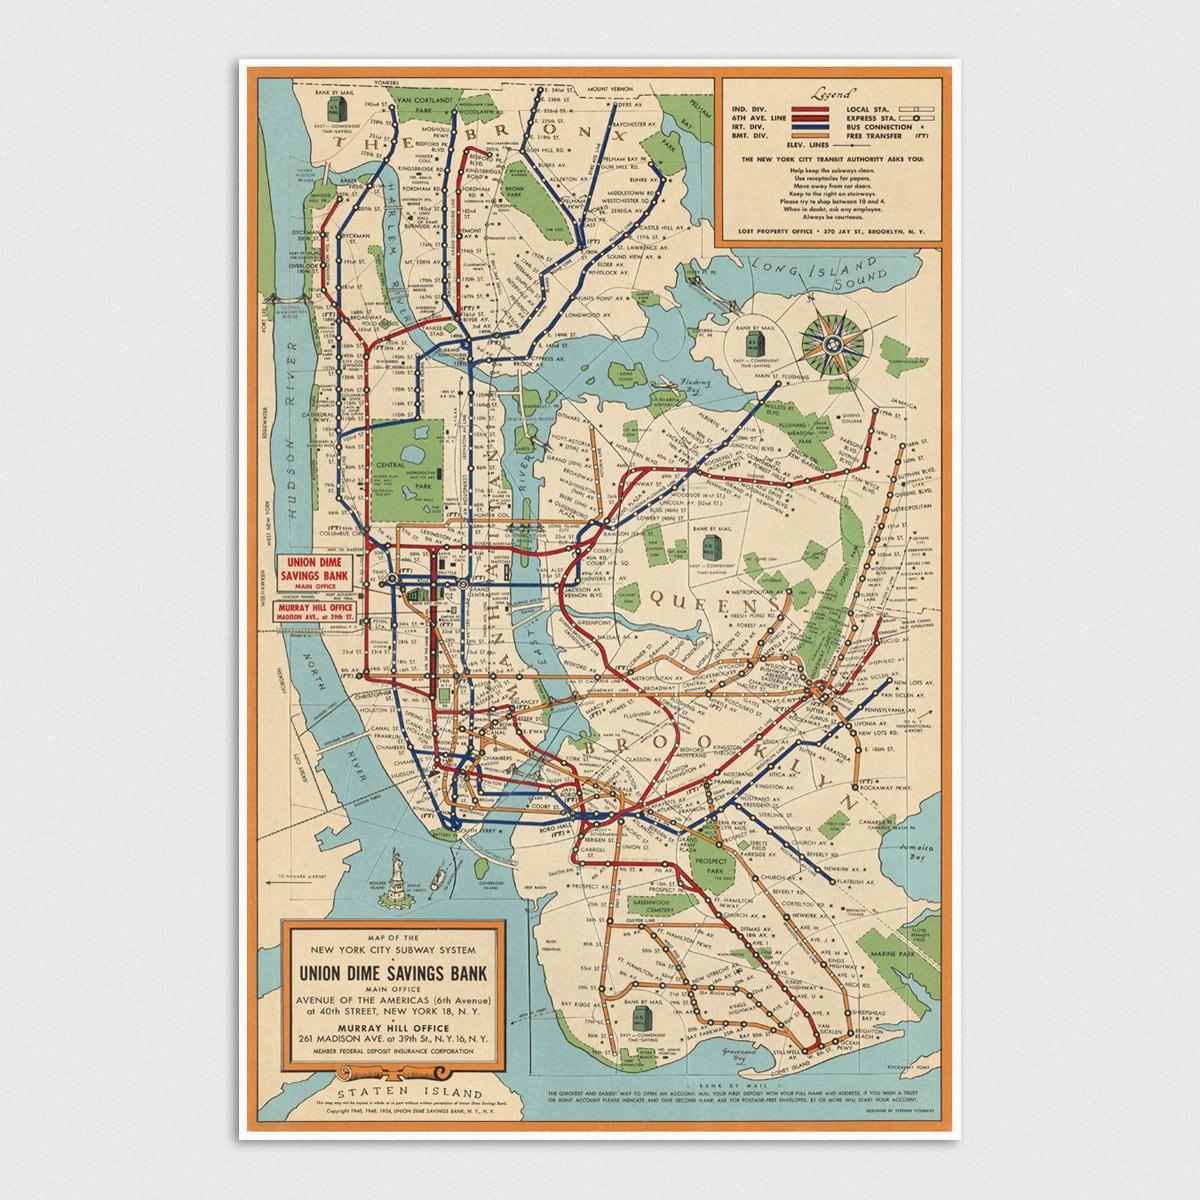 Man Looking At Subway Map.Old New York Subway Map Art Print 1954 Antique Map Archival Reproduction